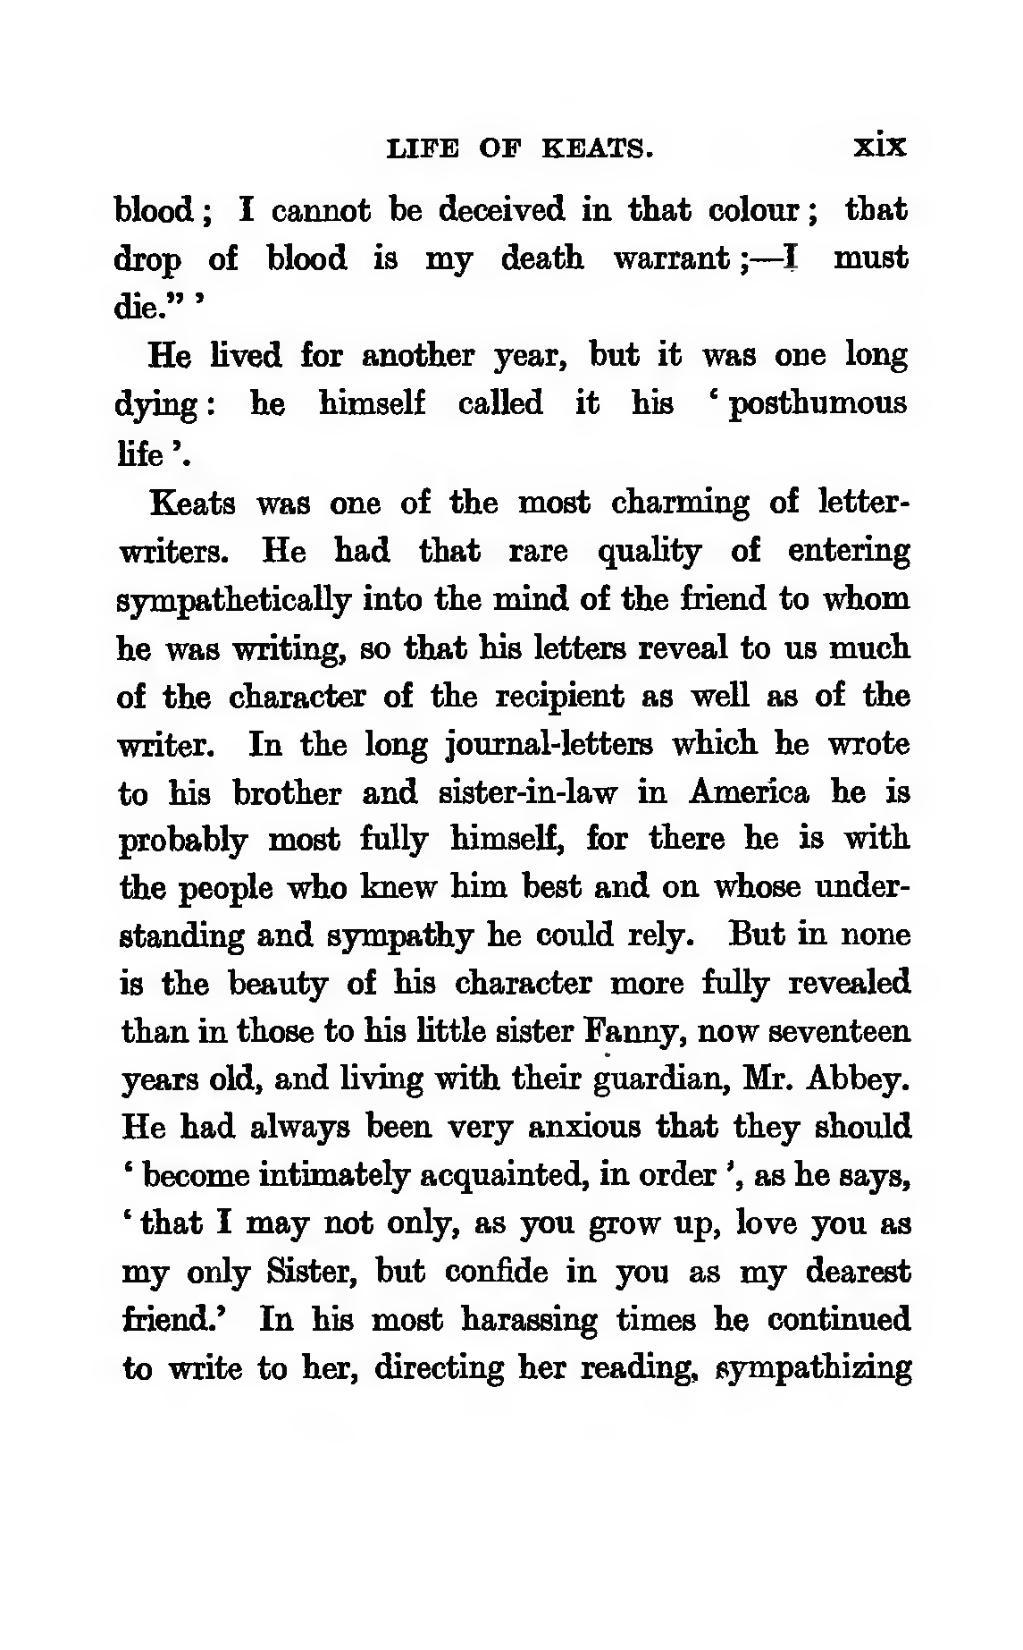 Pagekeats Poems Published In 1820 Robertson 1909djvu